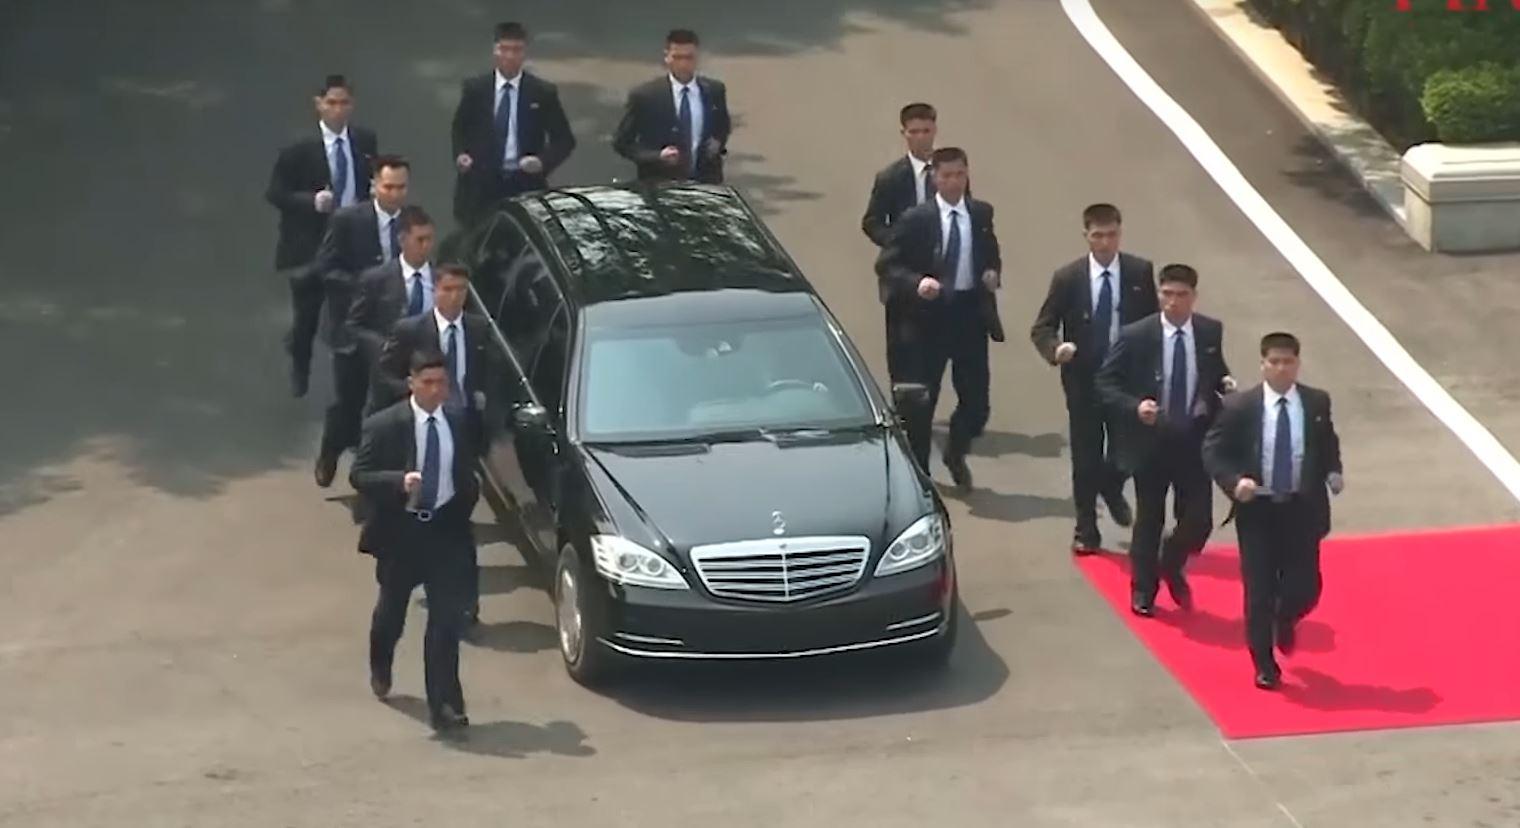 watch 12 bodyguards run alongside kim jong-un's mercedes limo